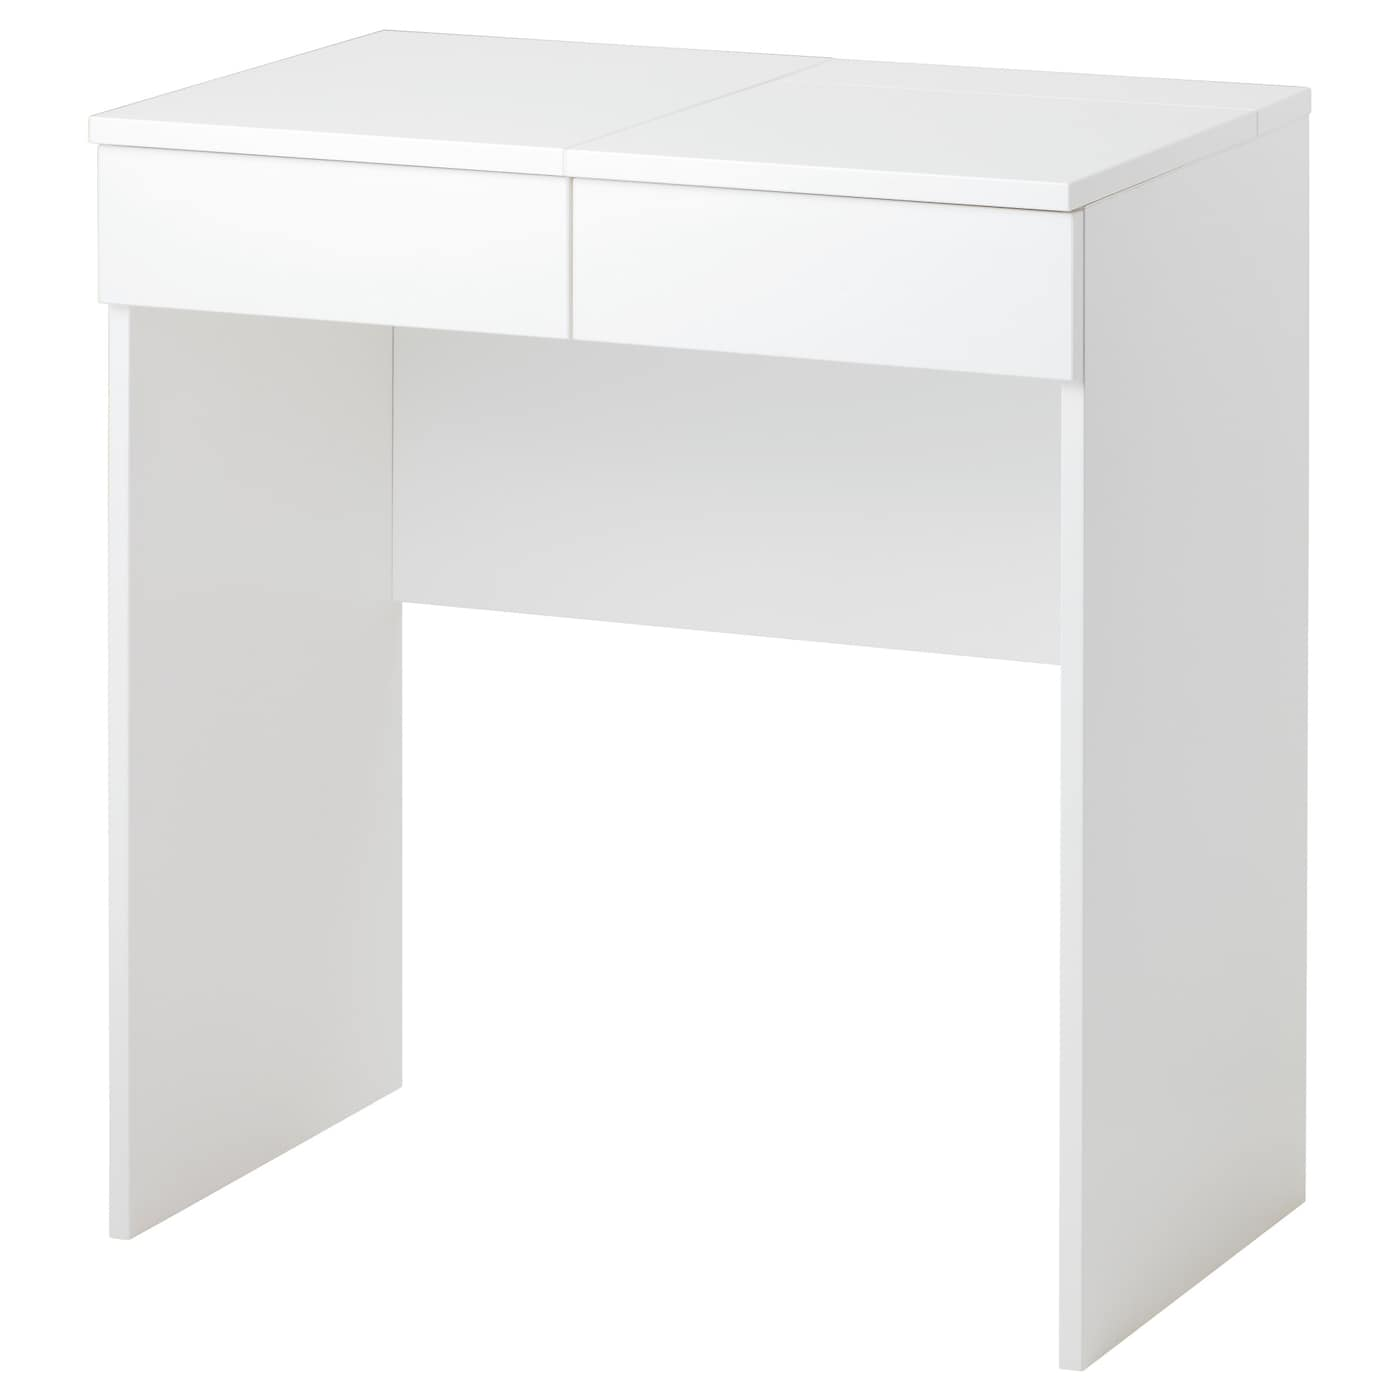 Brimnes dressing table white 70x42 cm ikea - Dressing extensible ikea ...